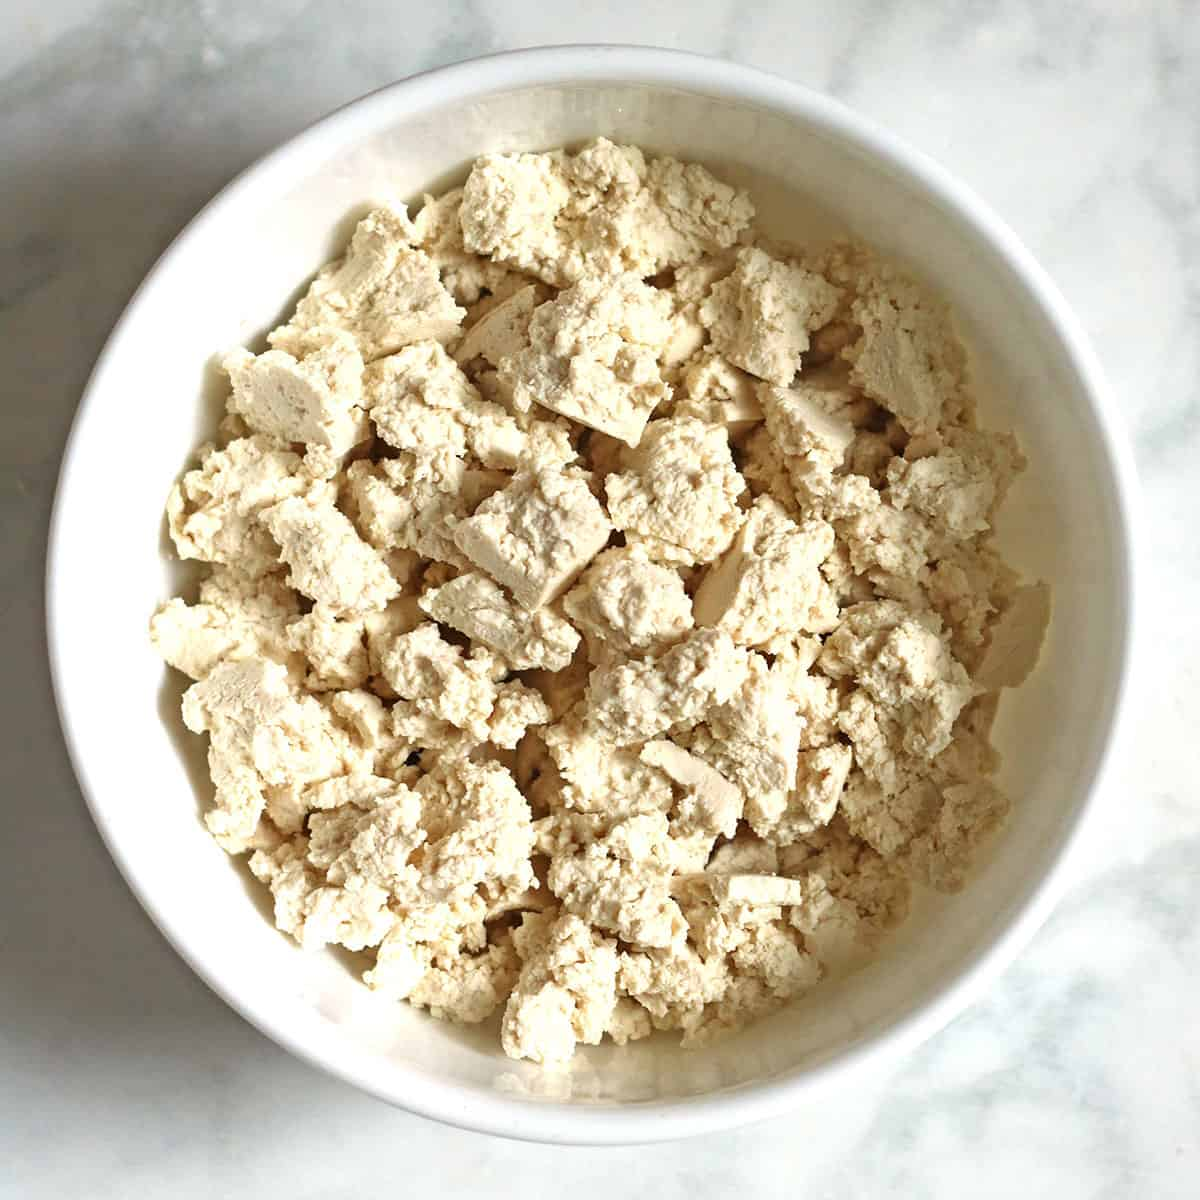 crumbled tofu in white bowl